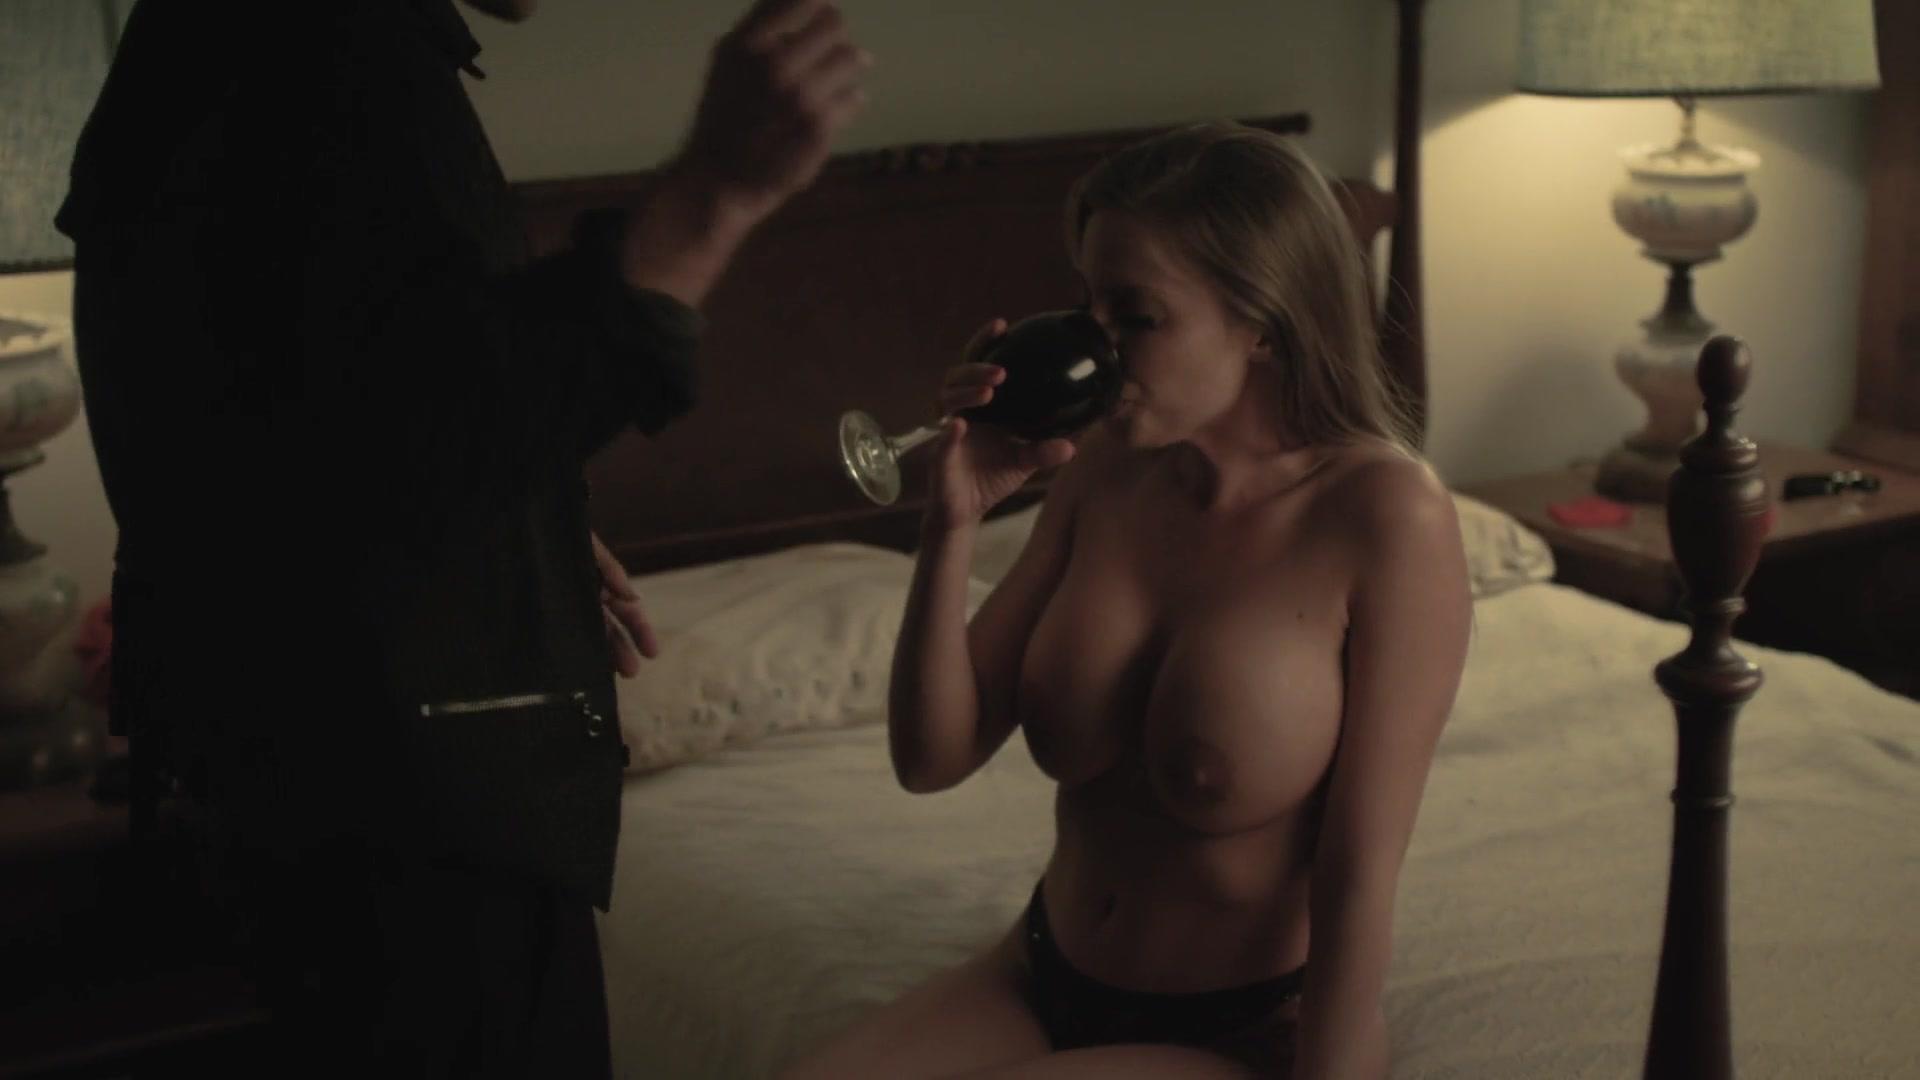 Stripper Gives Lap Dance